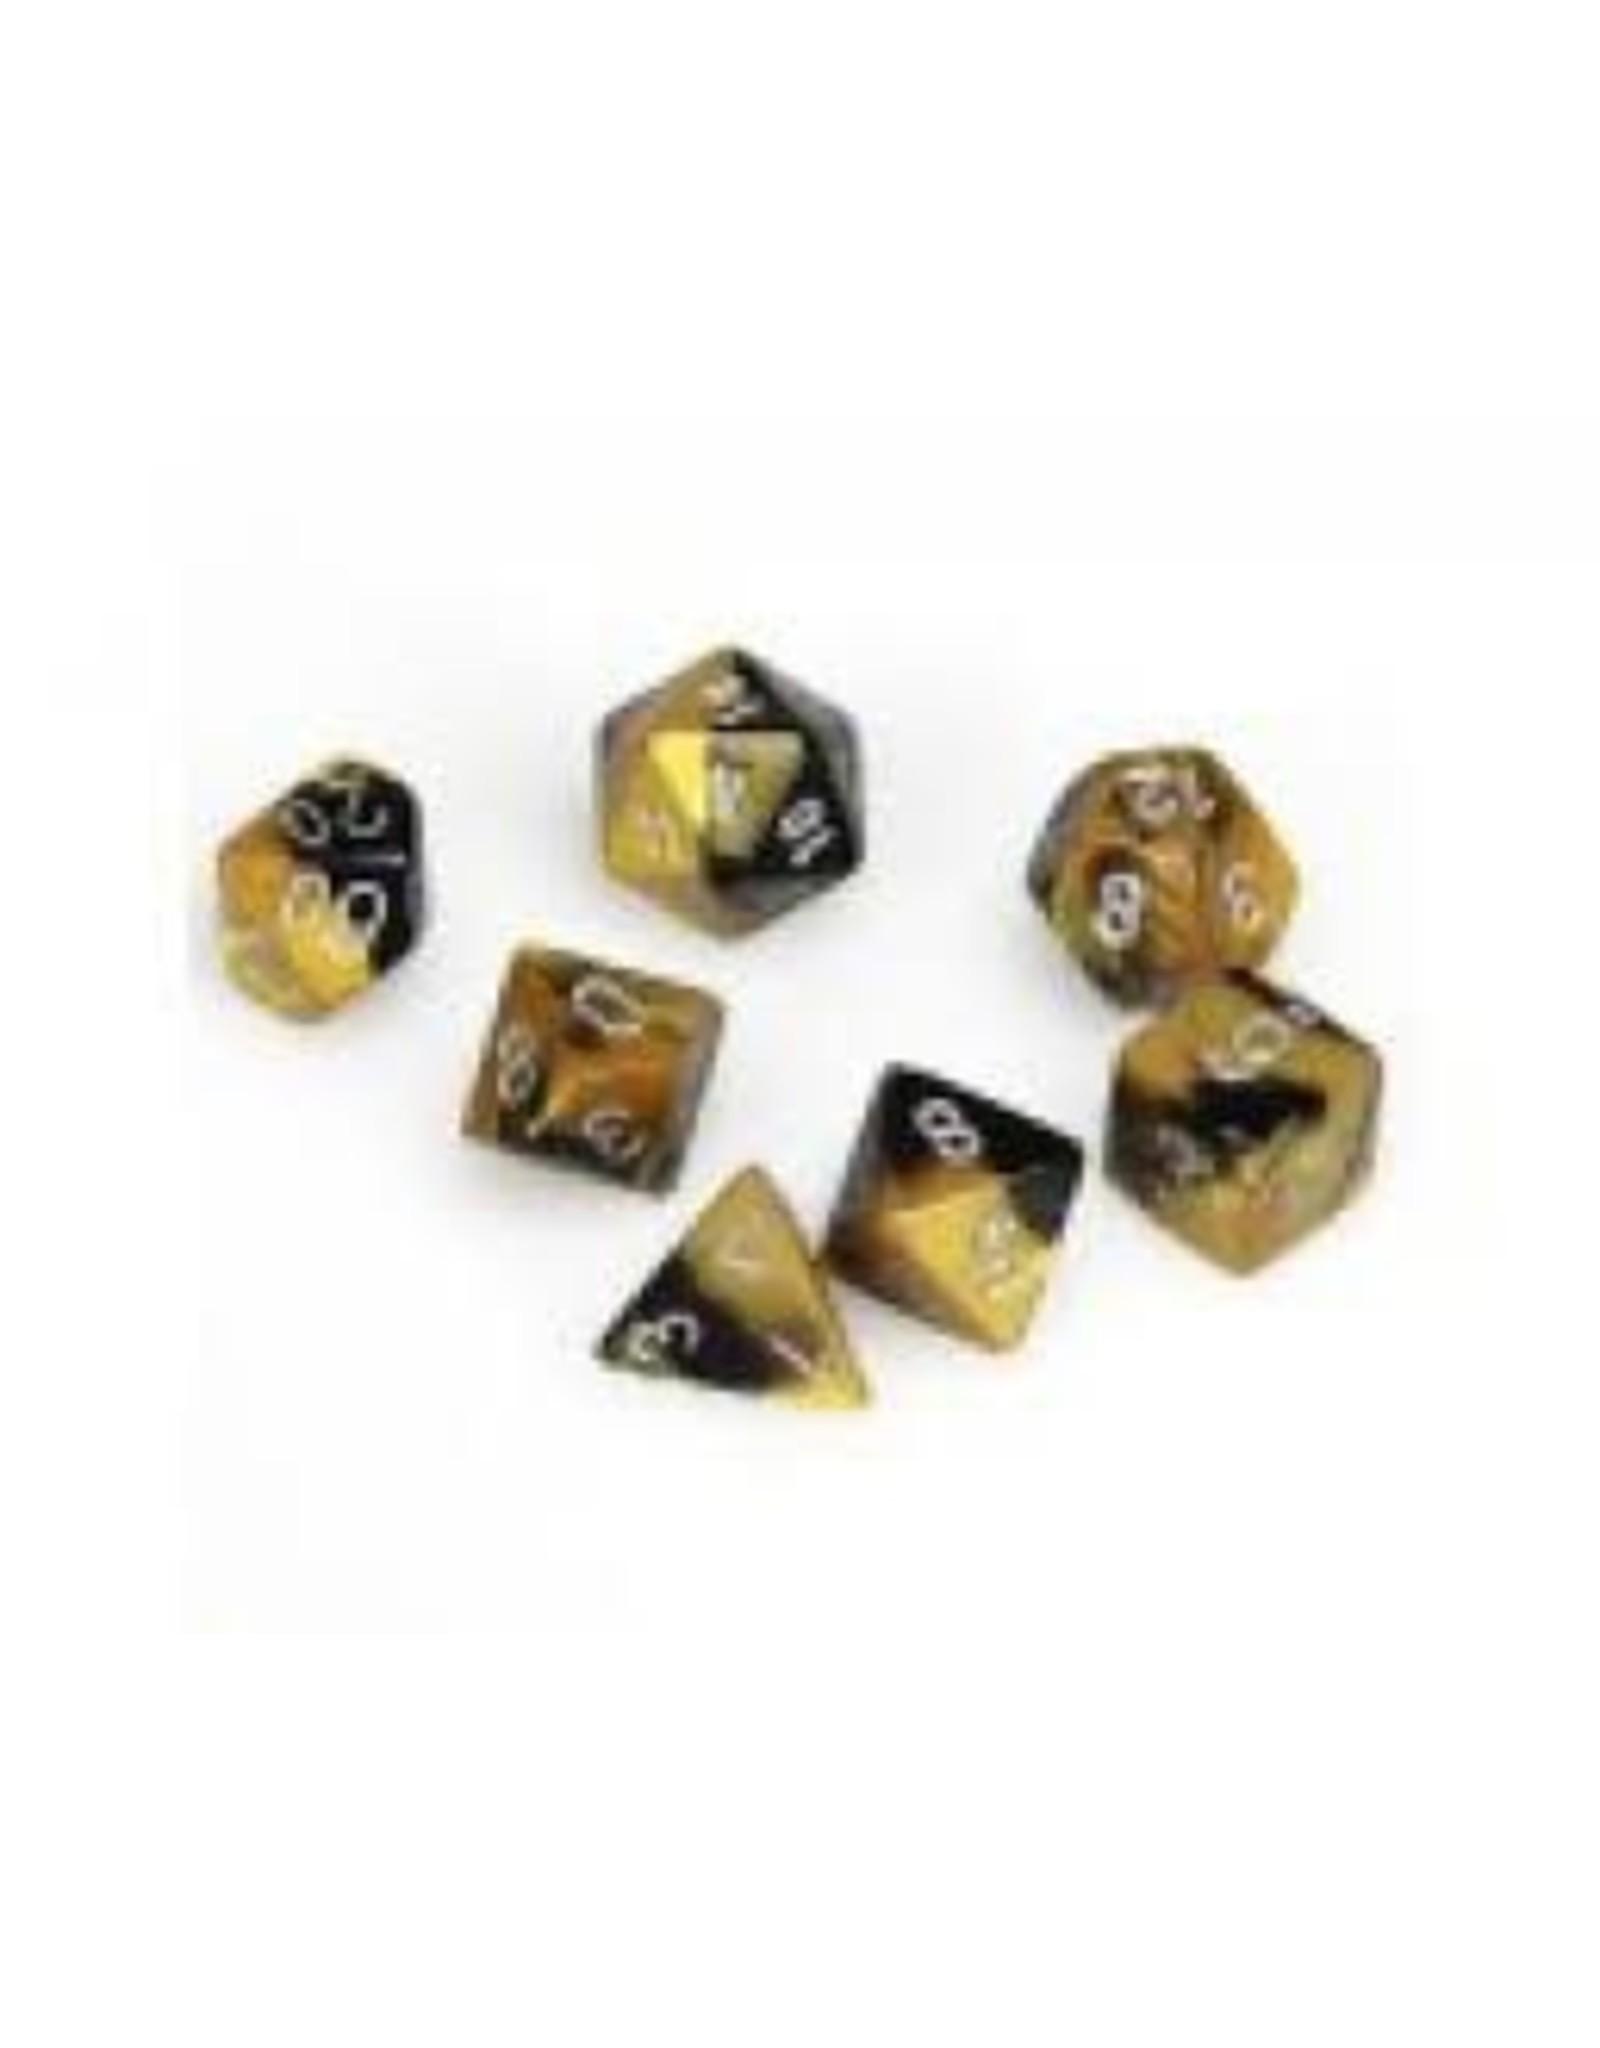 Chessex 7-Set Polyhedral Gemini 6:  Black Gold/Silv